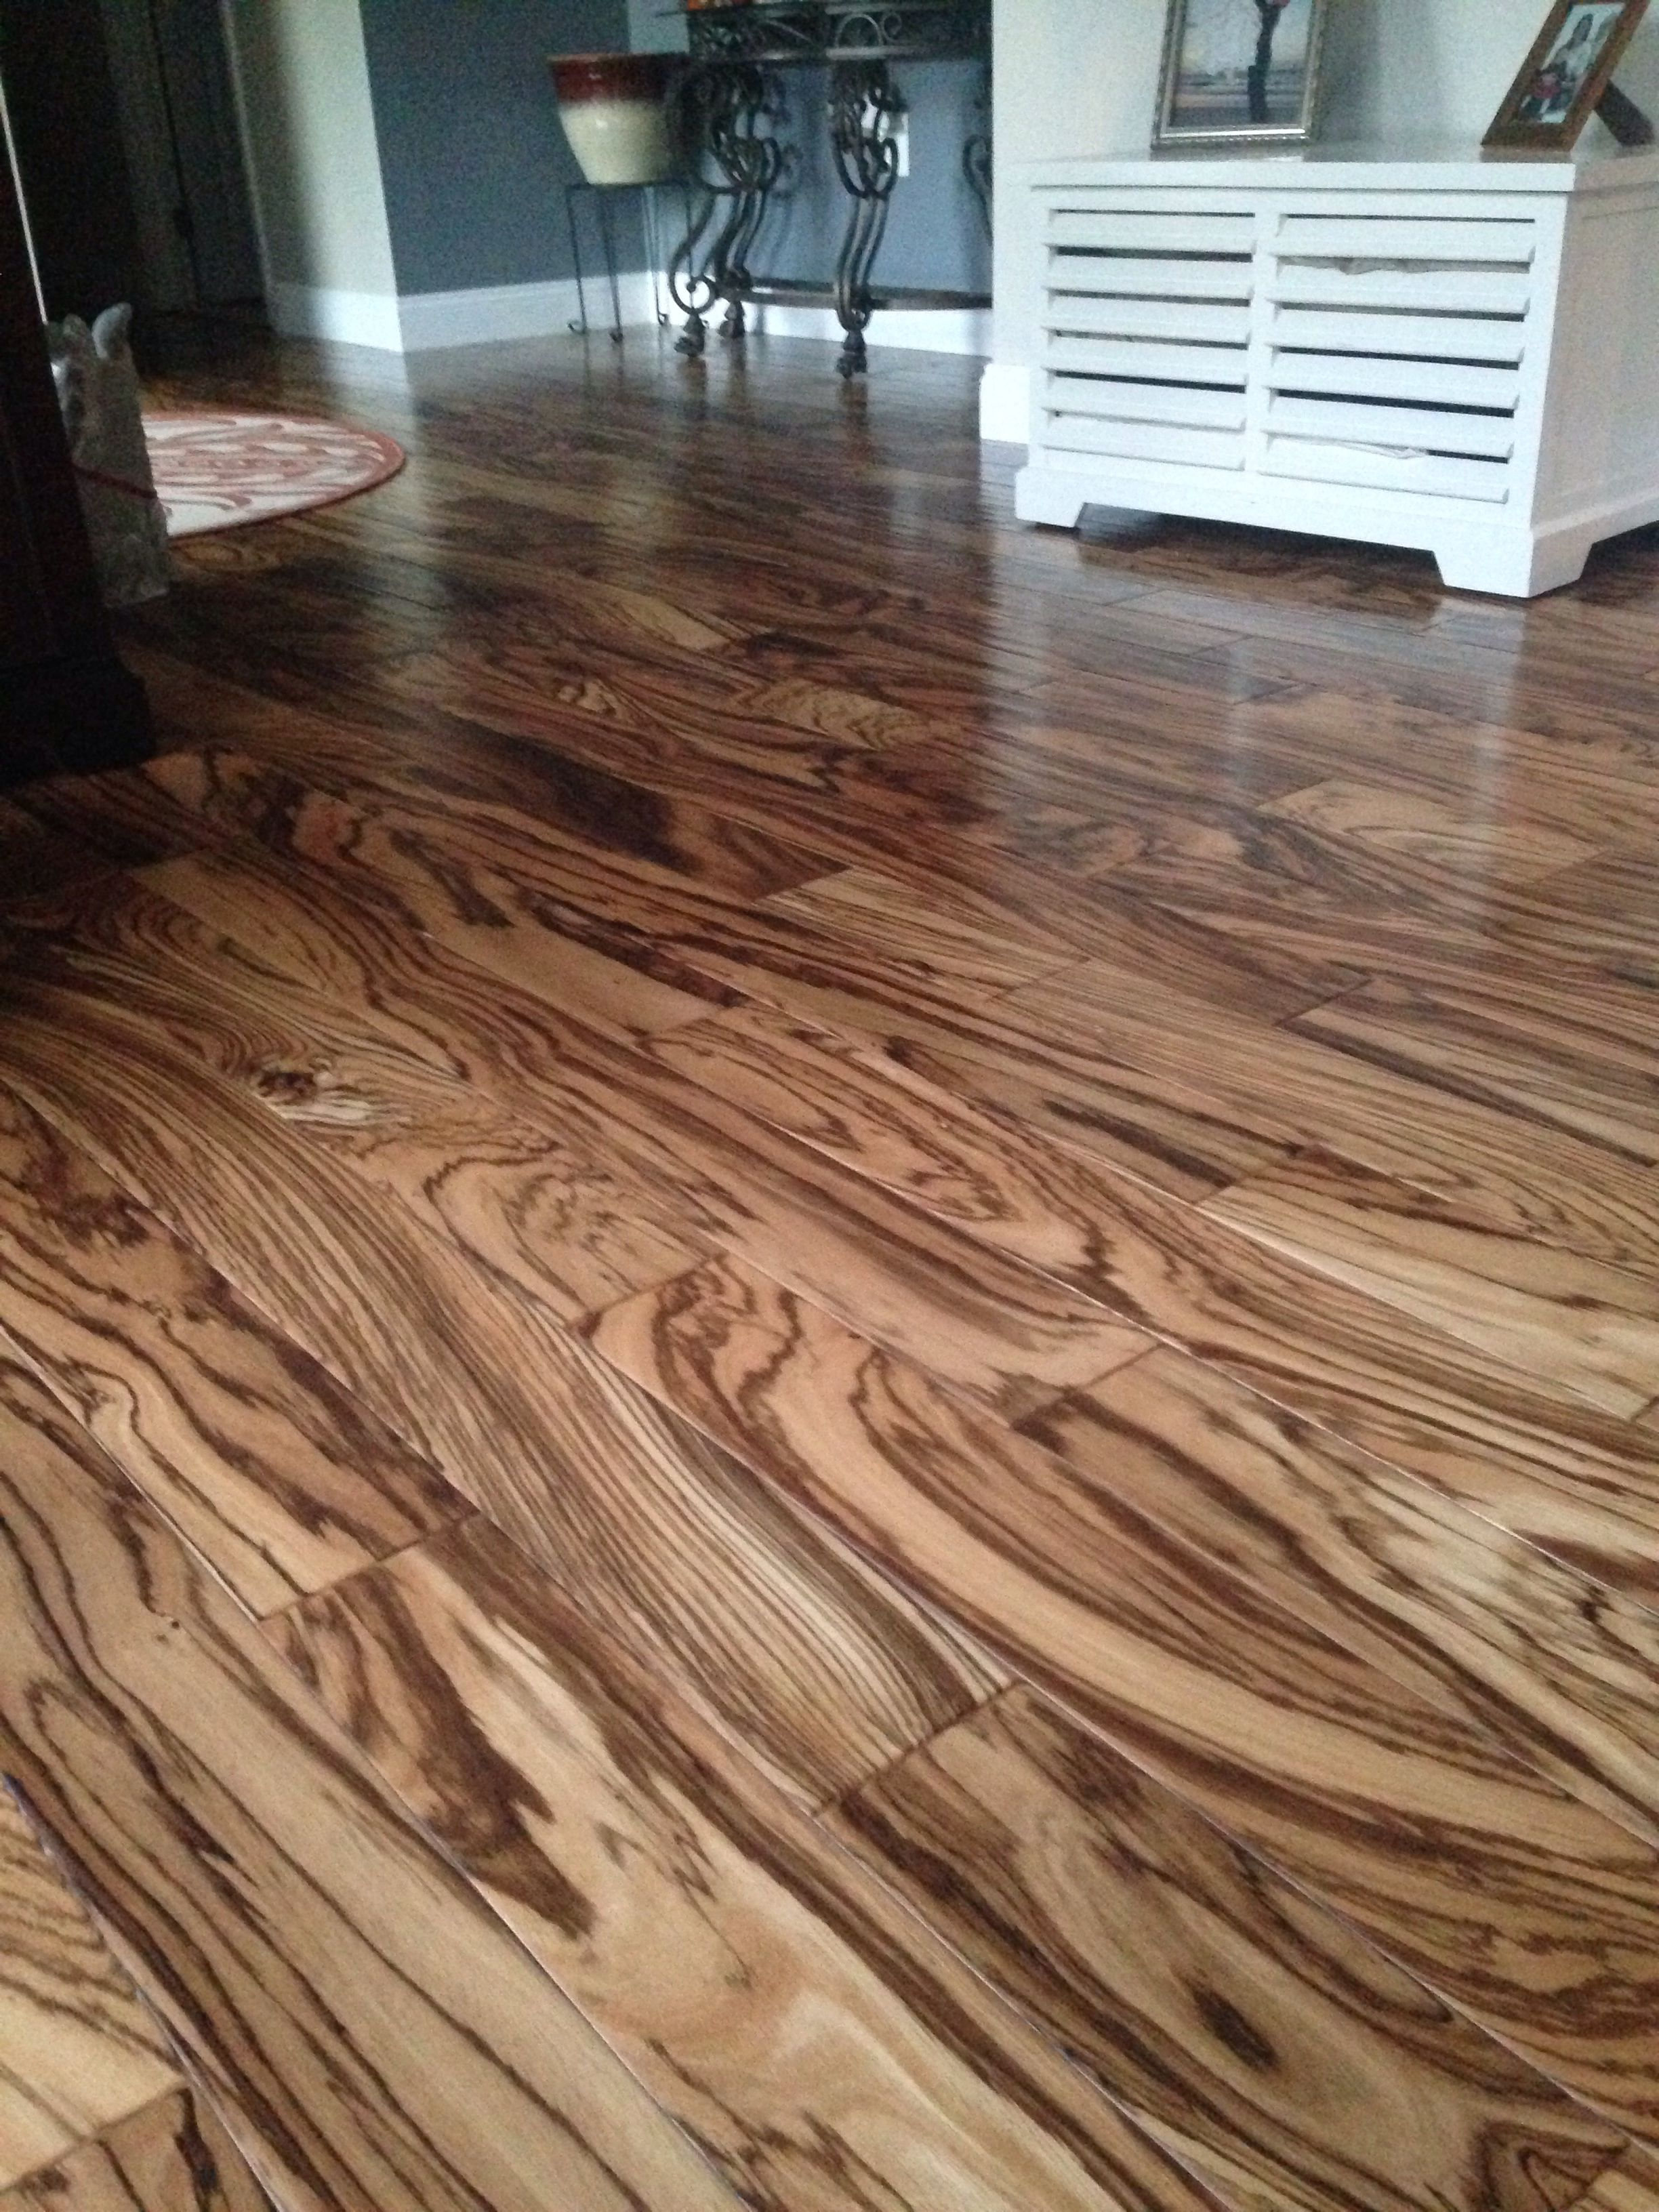 Tiger wood hardwood floors  House Ideas in 2019  Diy